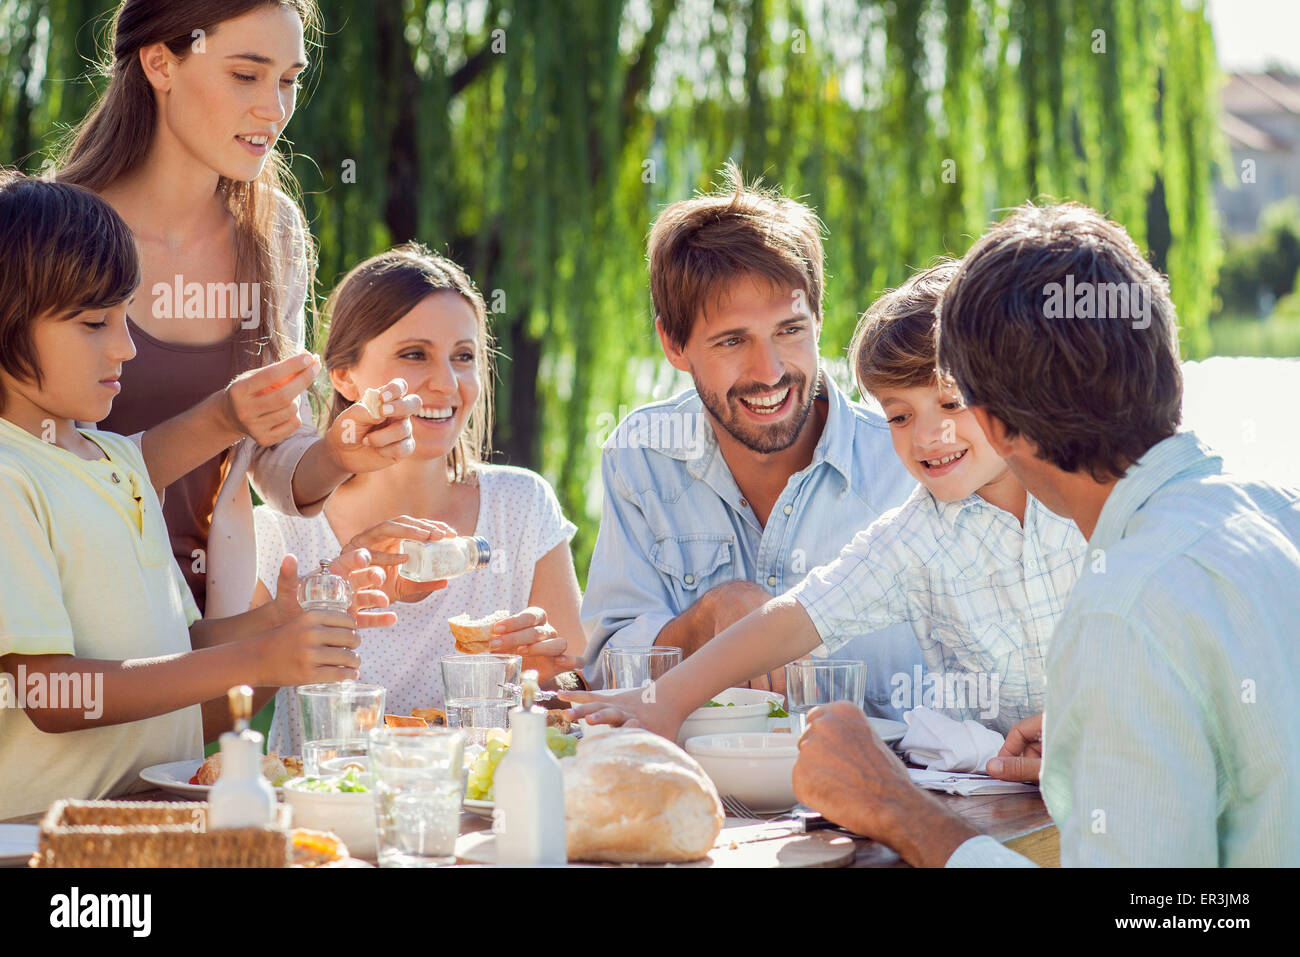 Family enjoying breakfast together outdoors - Stock Image